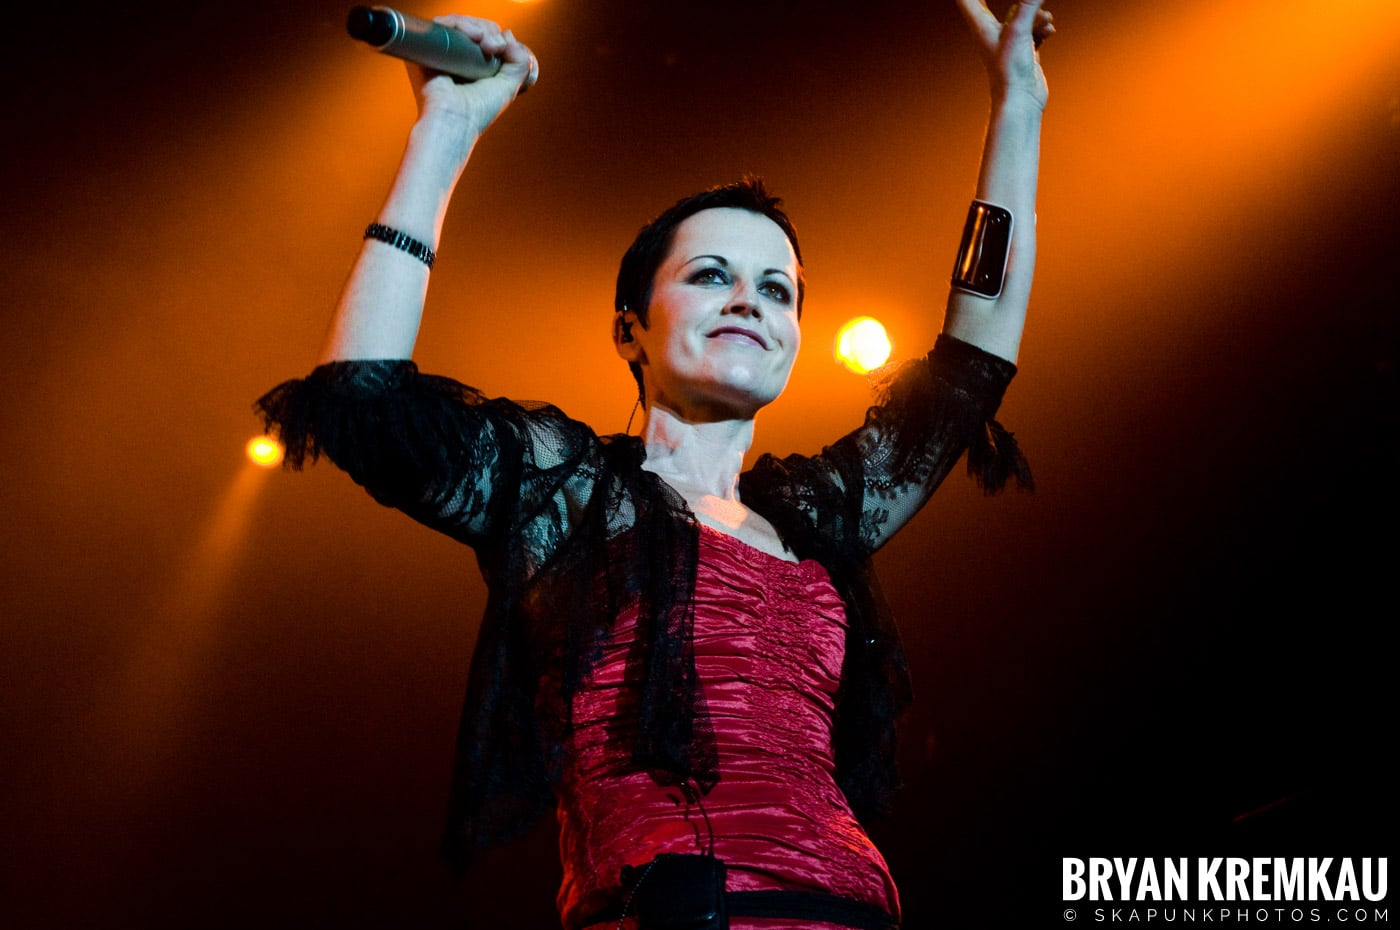 The Cranberries @ Nokia Theatre, NYC - 11.18.09 (12)